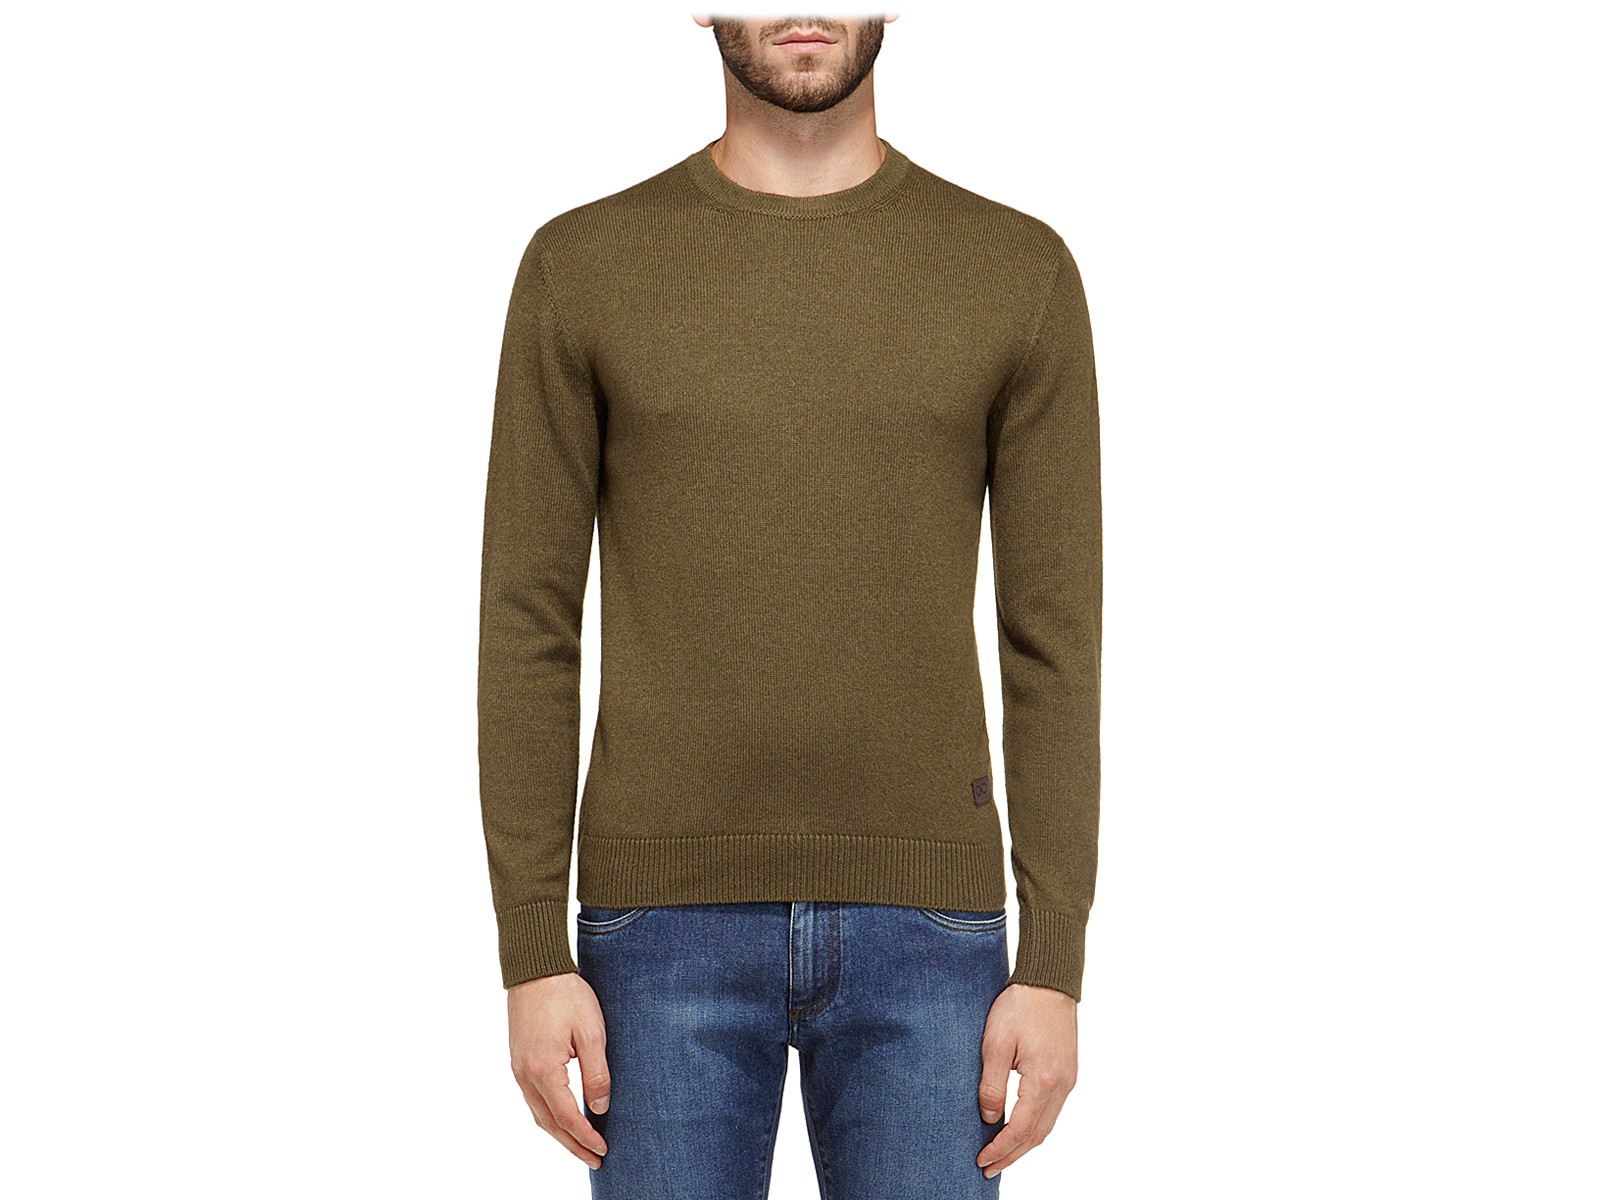 SALVATORE FERRAGAMO Round Neck Sweater_Donotuse in Khaki Green